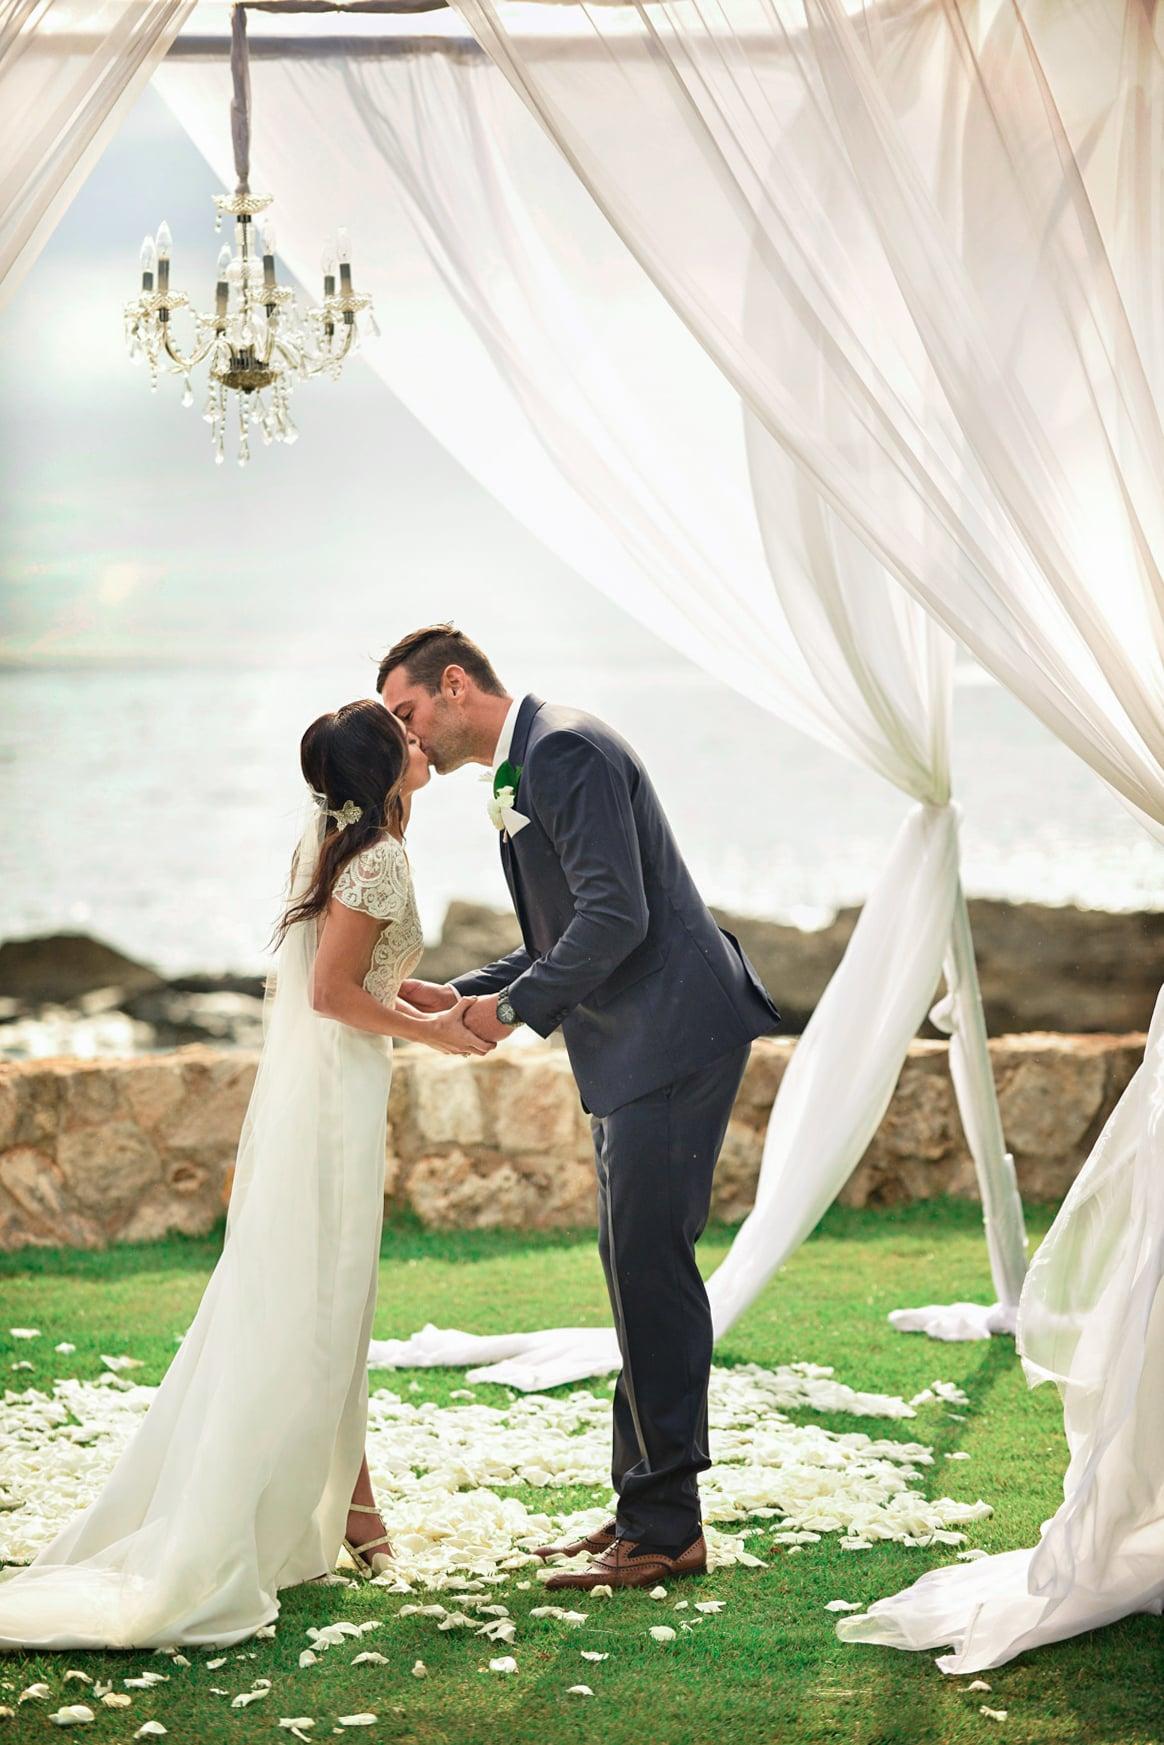 lanikuhonua beach wedding oahu hawaii stephen ludwig008.jpg